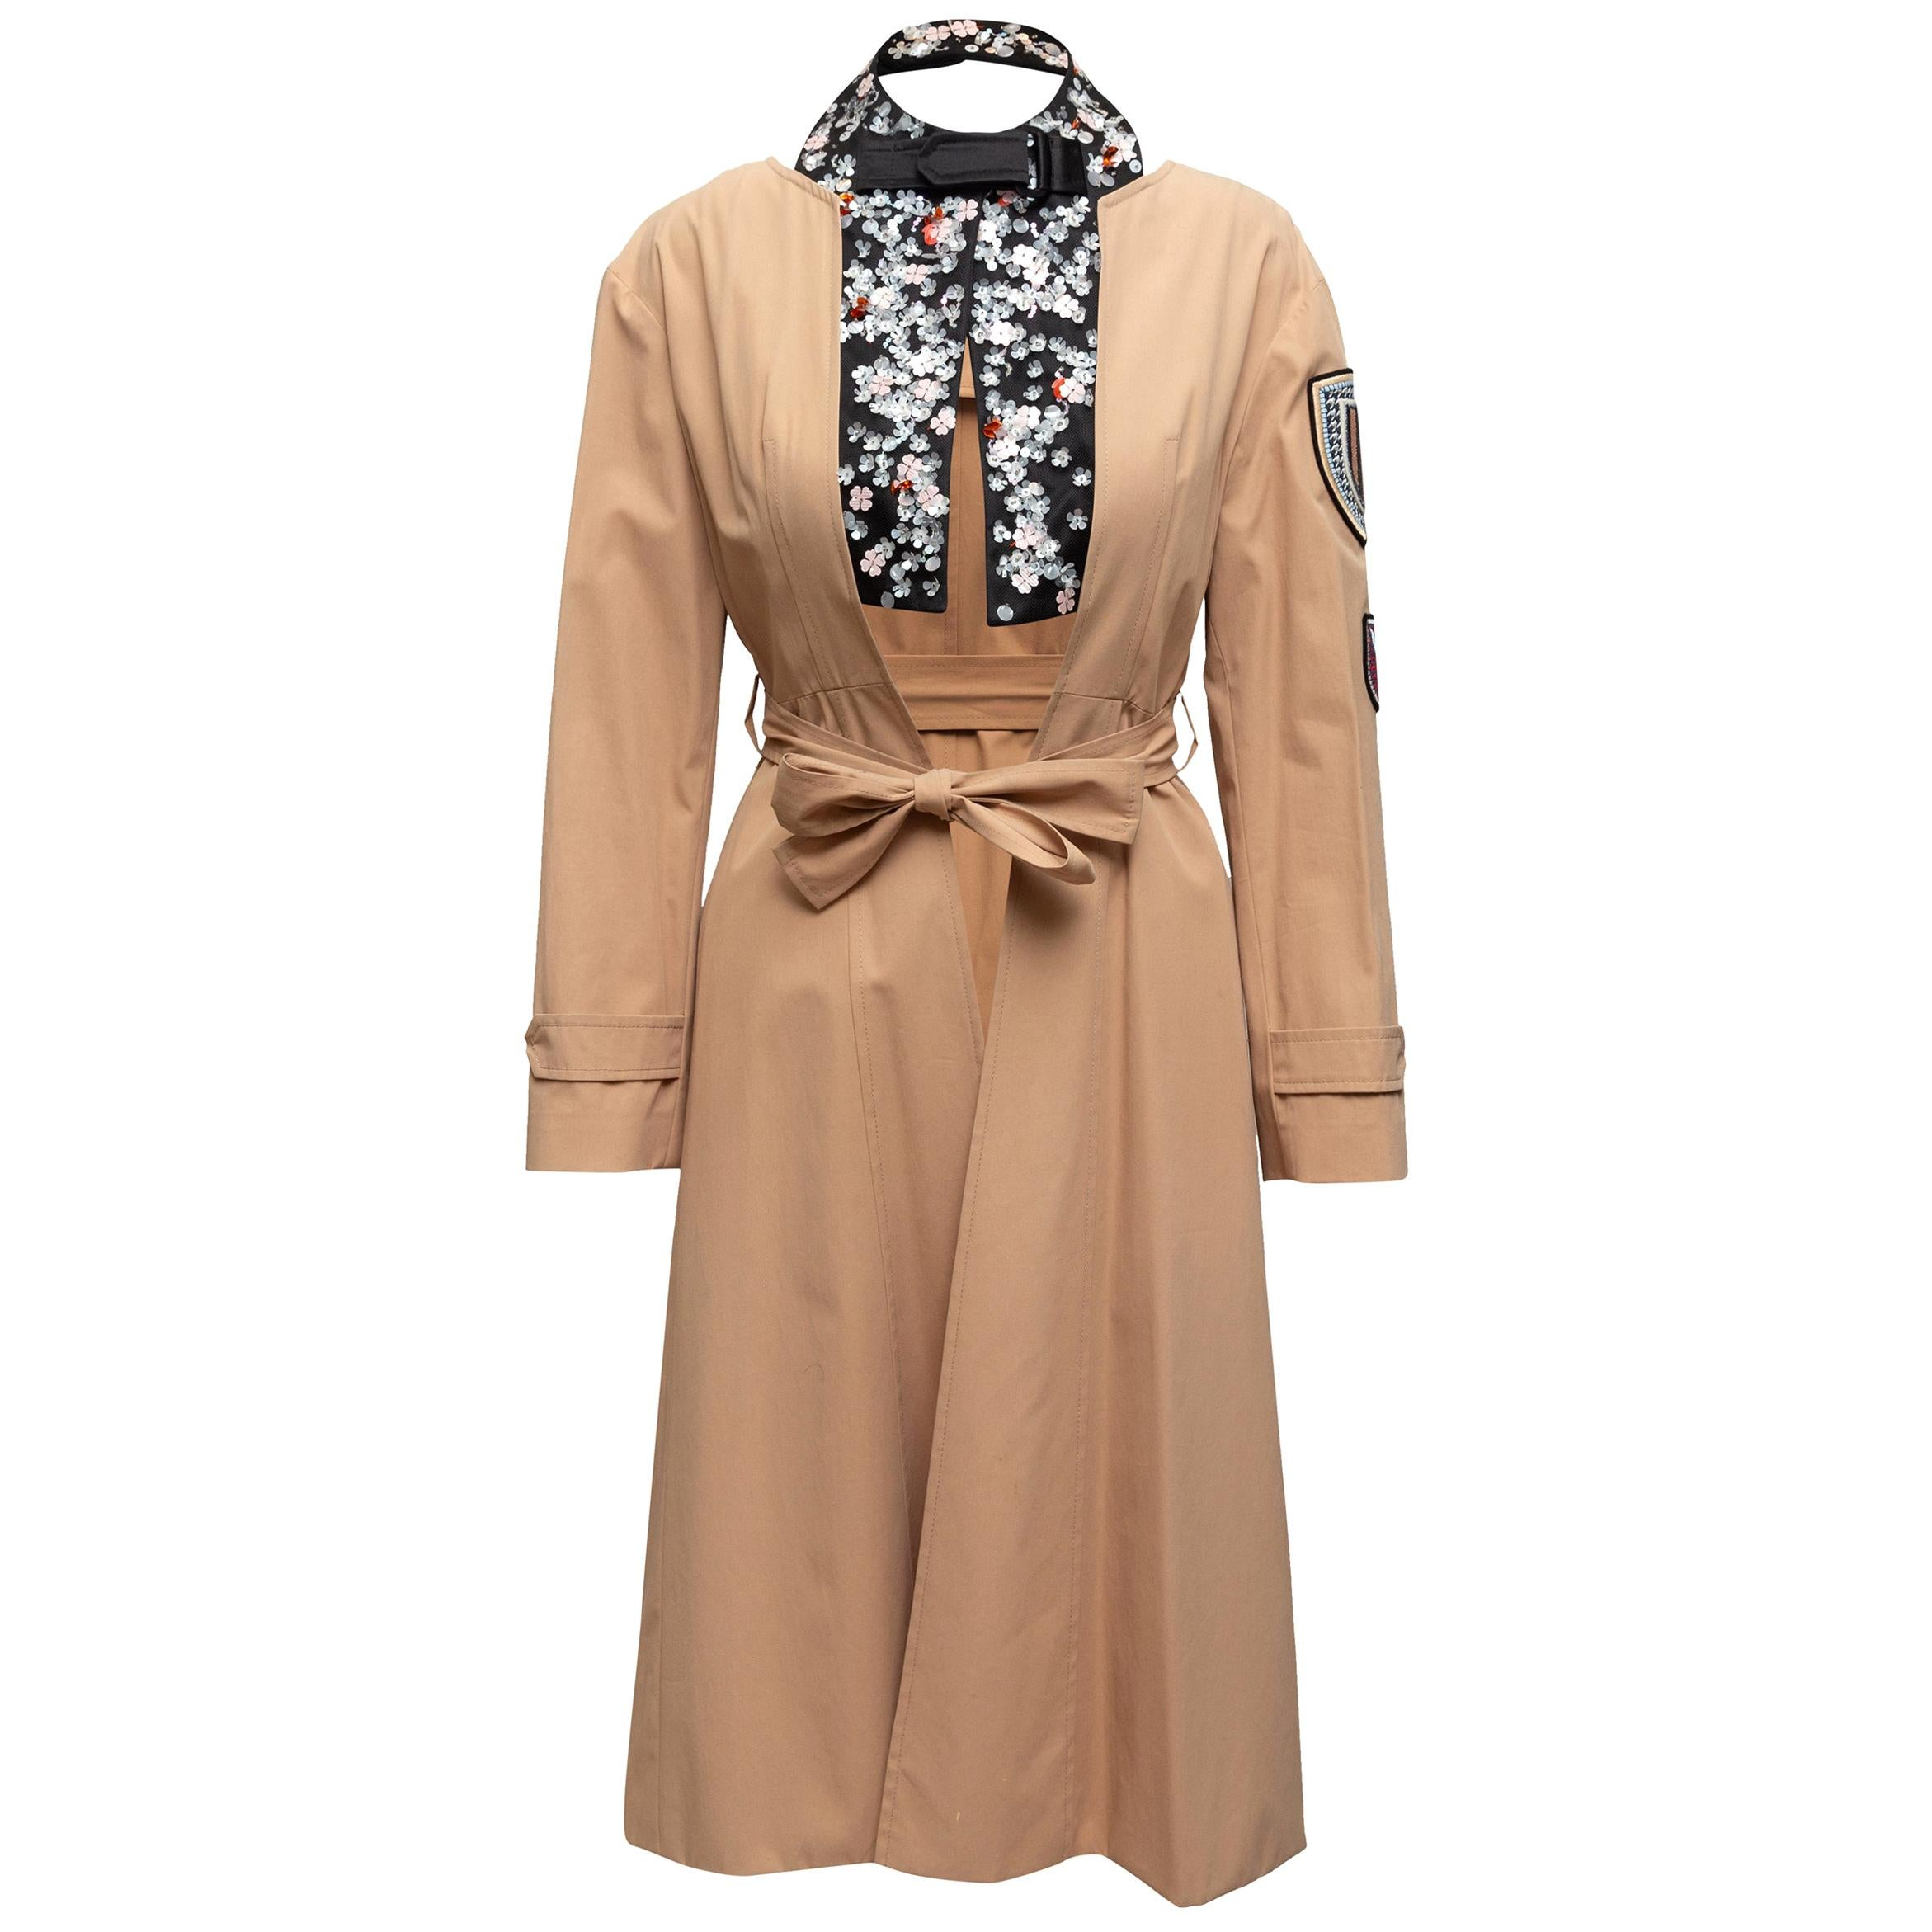 Christian Dior Tan Embellshed Trench Coat